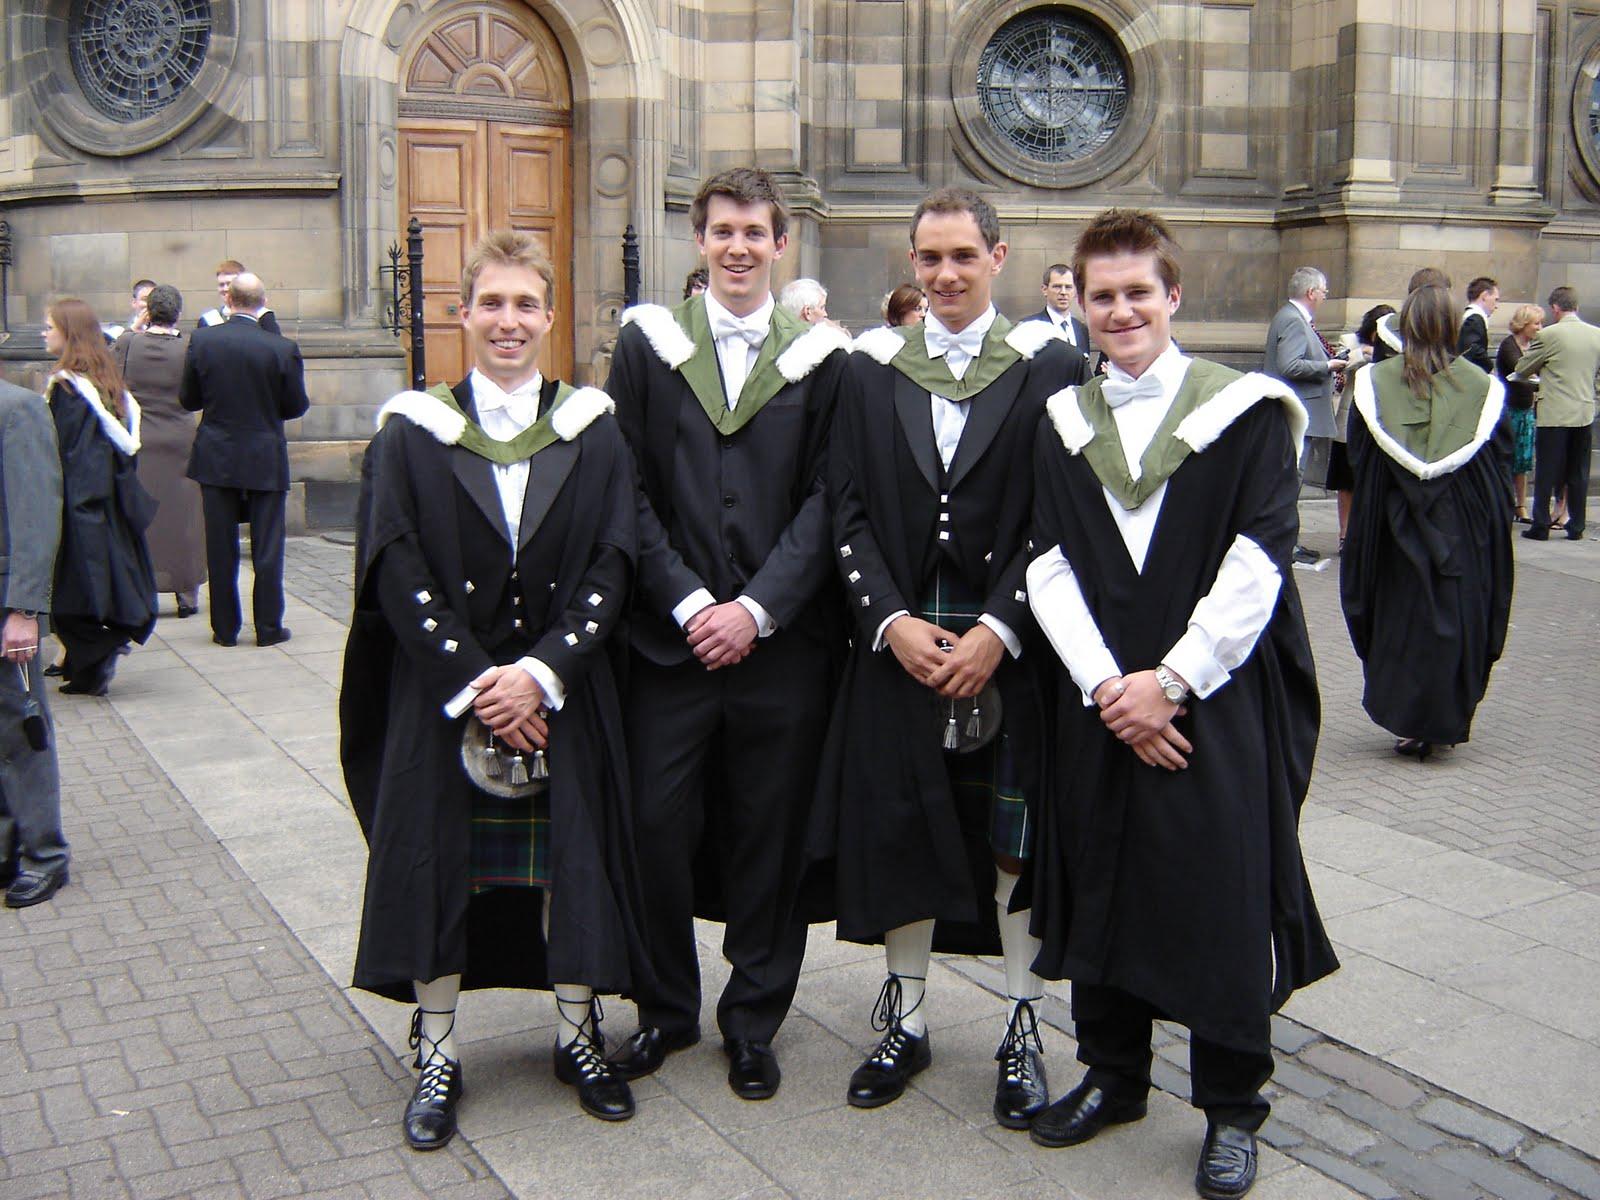 edinburgh university graduation what to wear